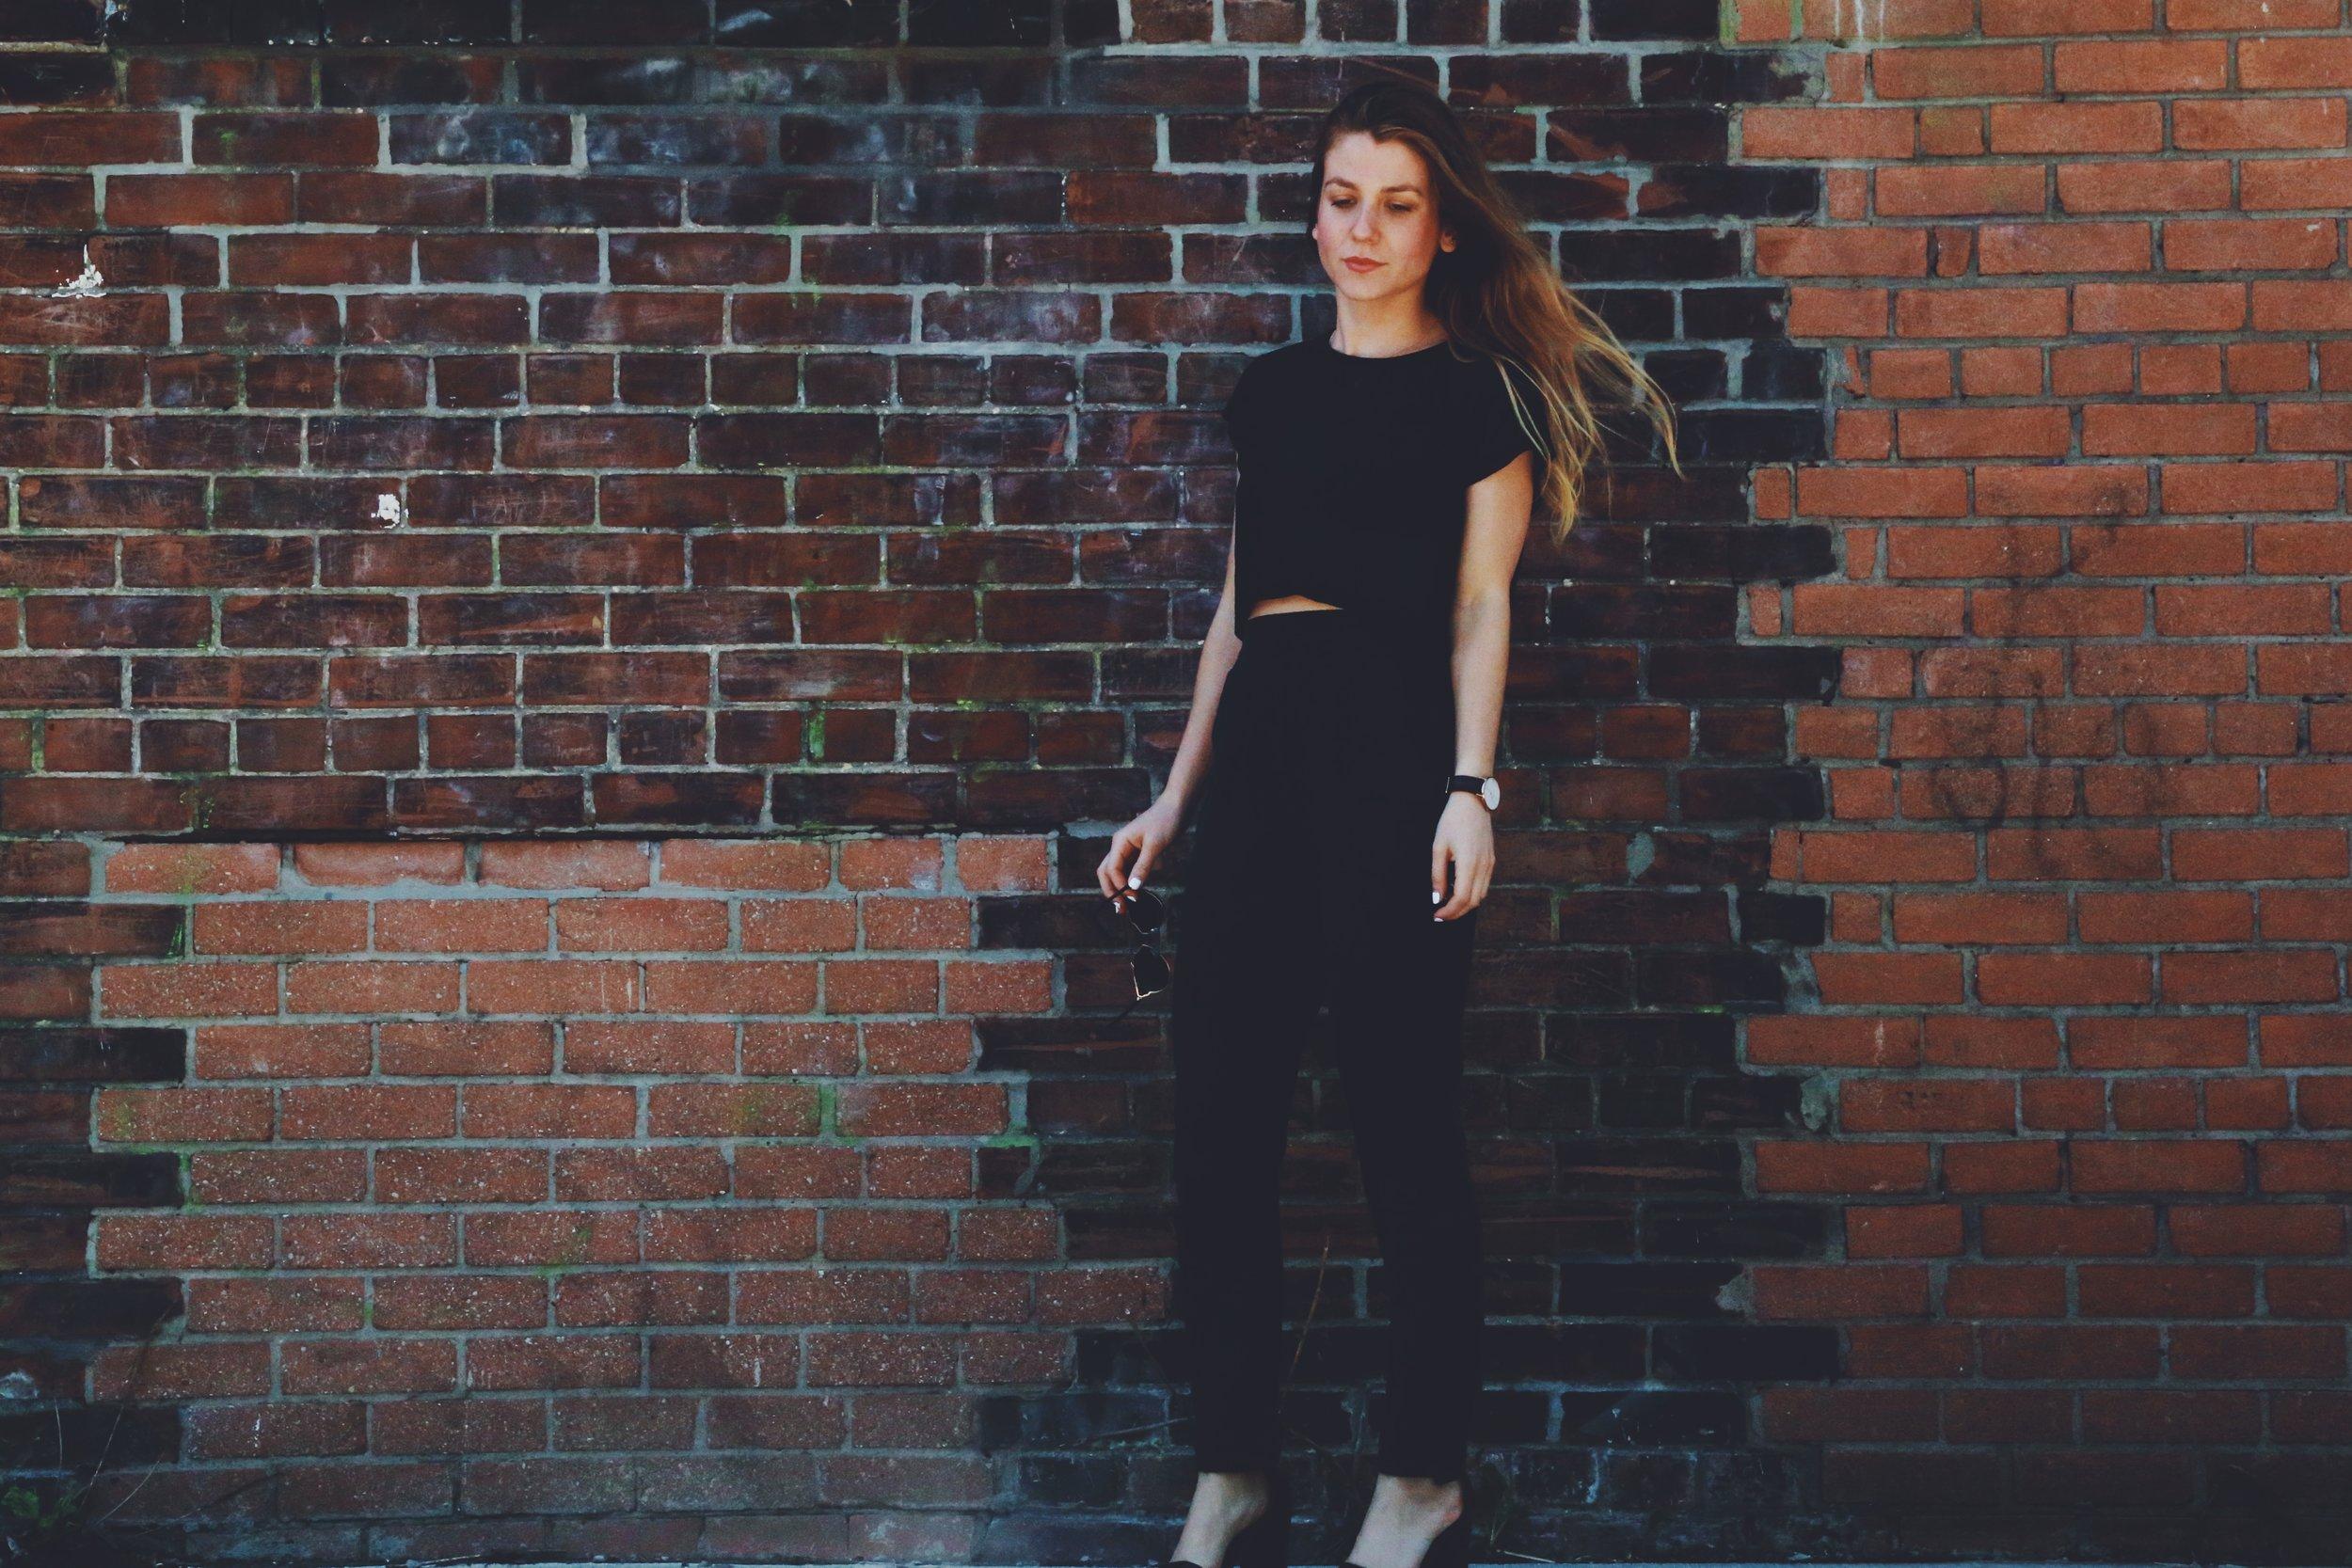 Black outfit 2-blog.JPG